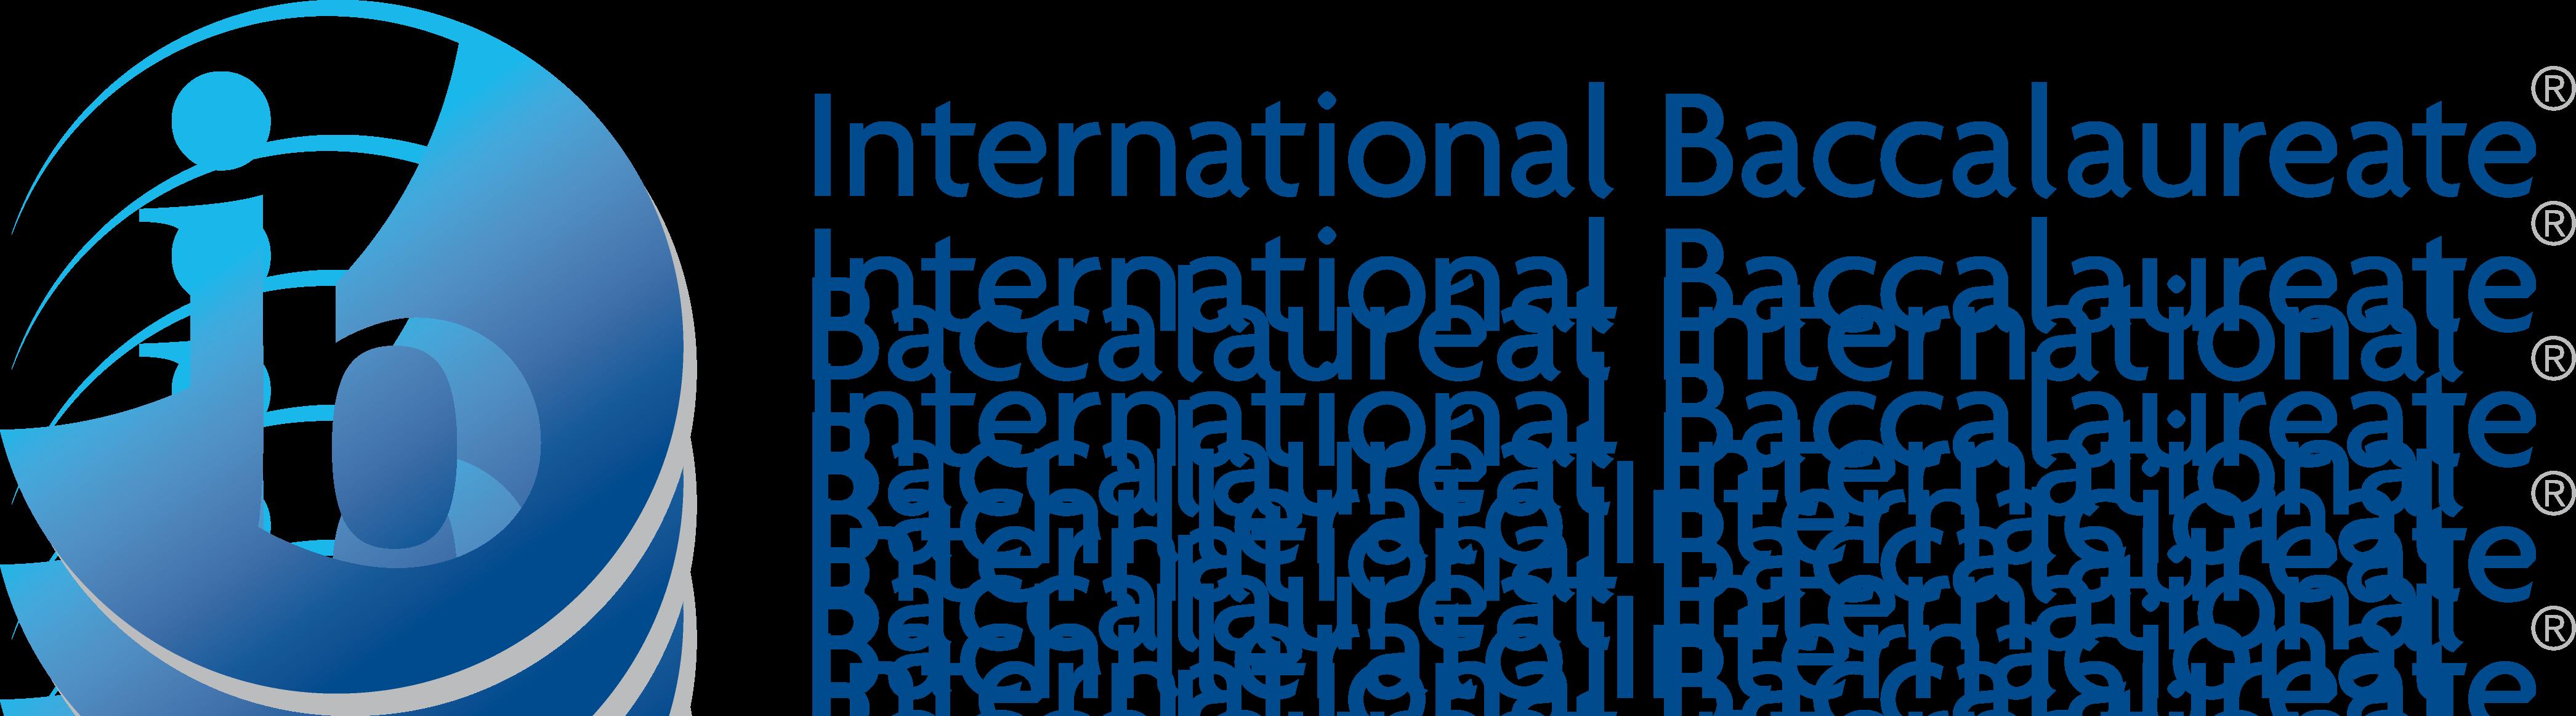 logo for International Baccalaureate